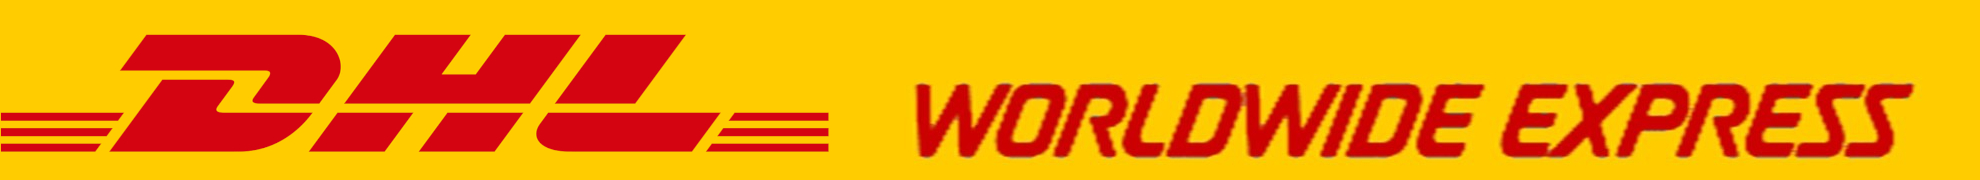 DHL WORLDWIDE